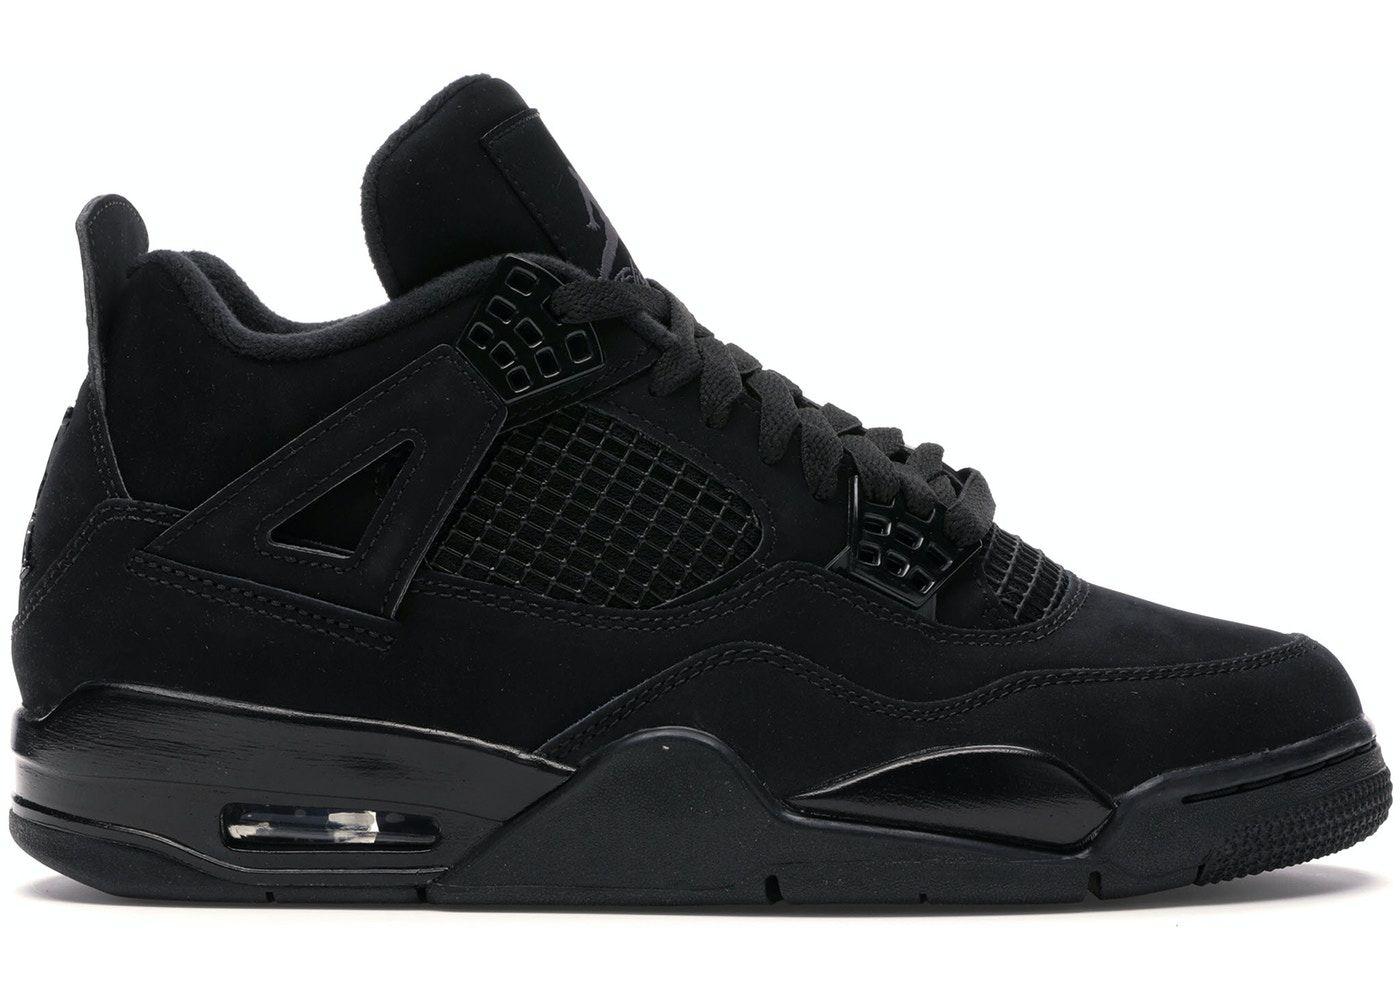 Jordan 4 Retro Black Cat (2020) in 2020 Jordan 4, Jordan